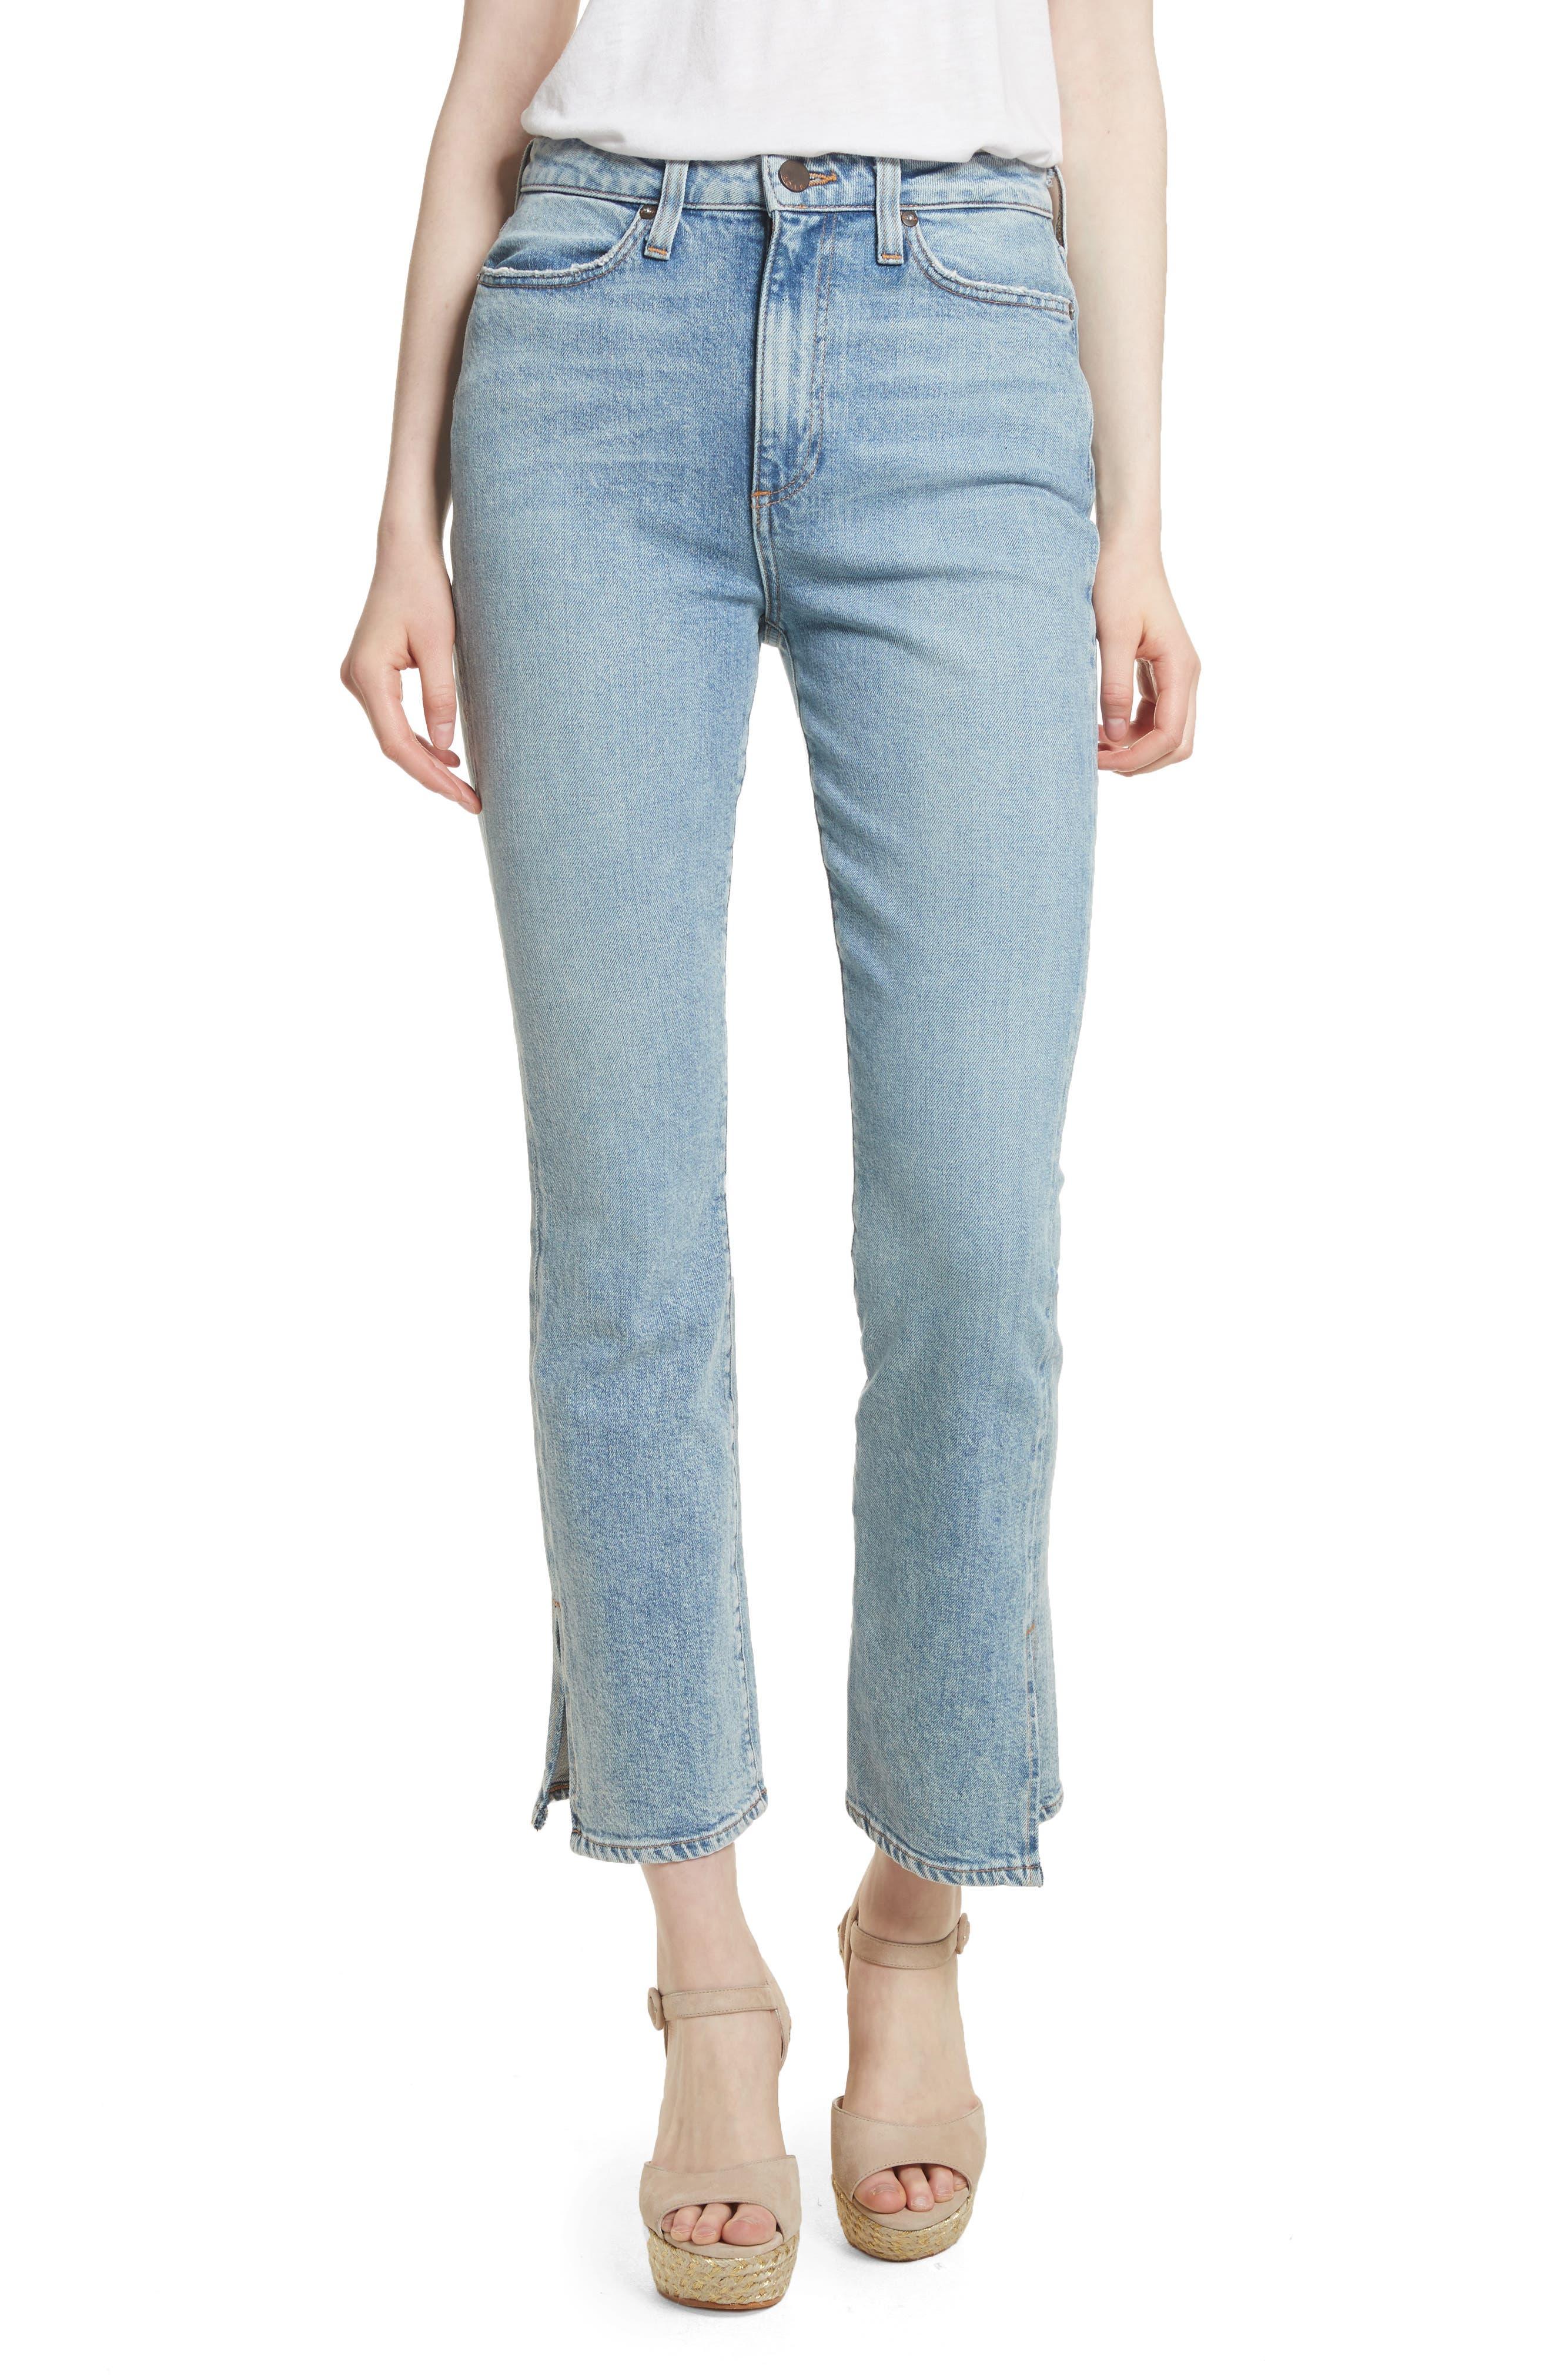 AO.LA Fabulous High Waist Baby Bootcut Jeans,                         Main,                         color,